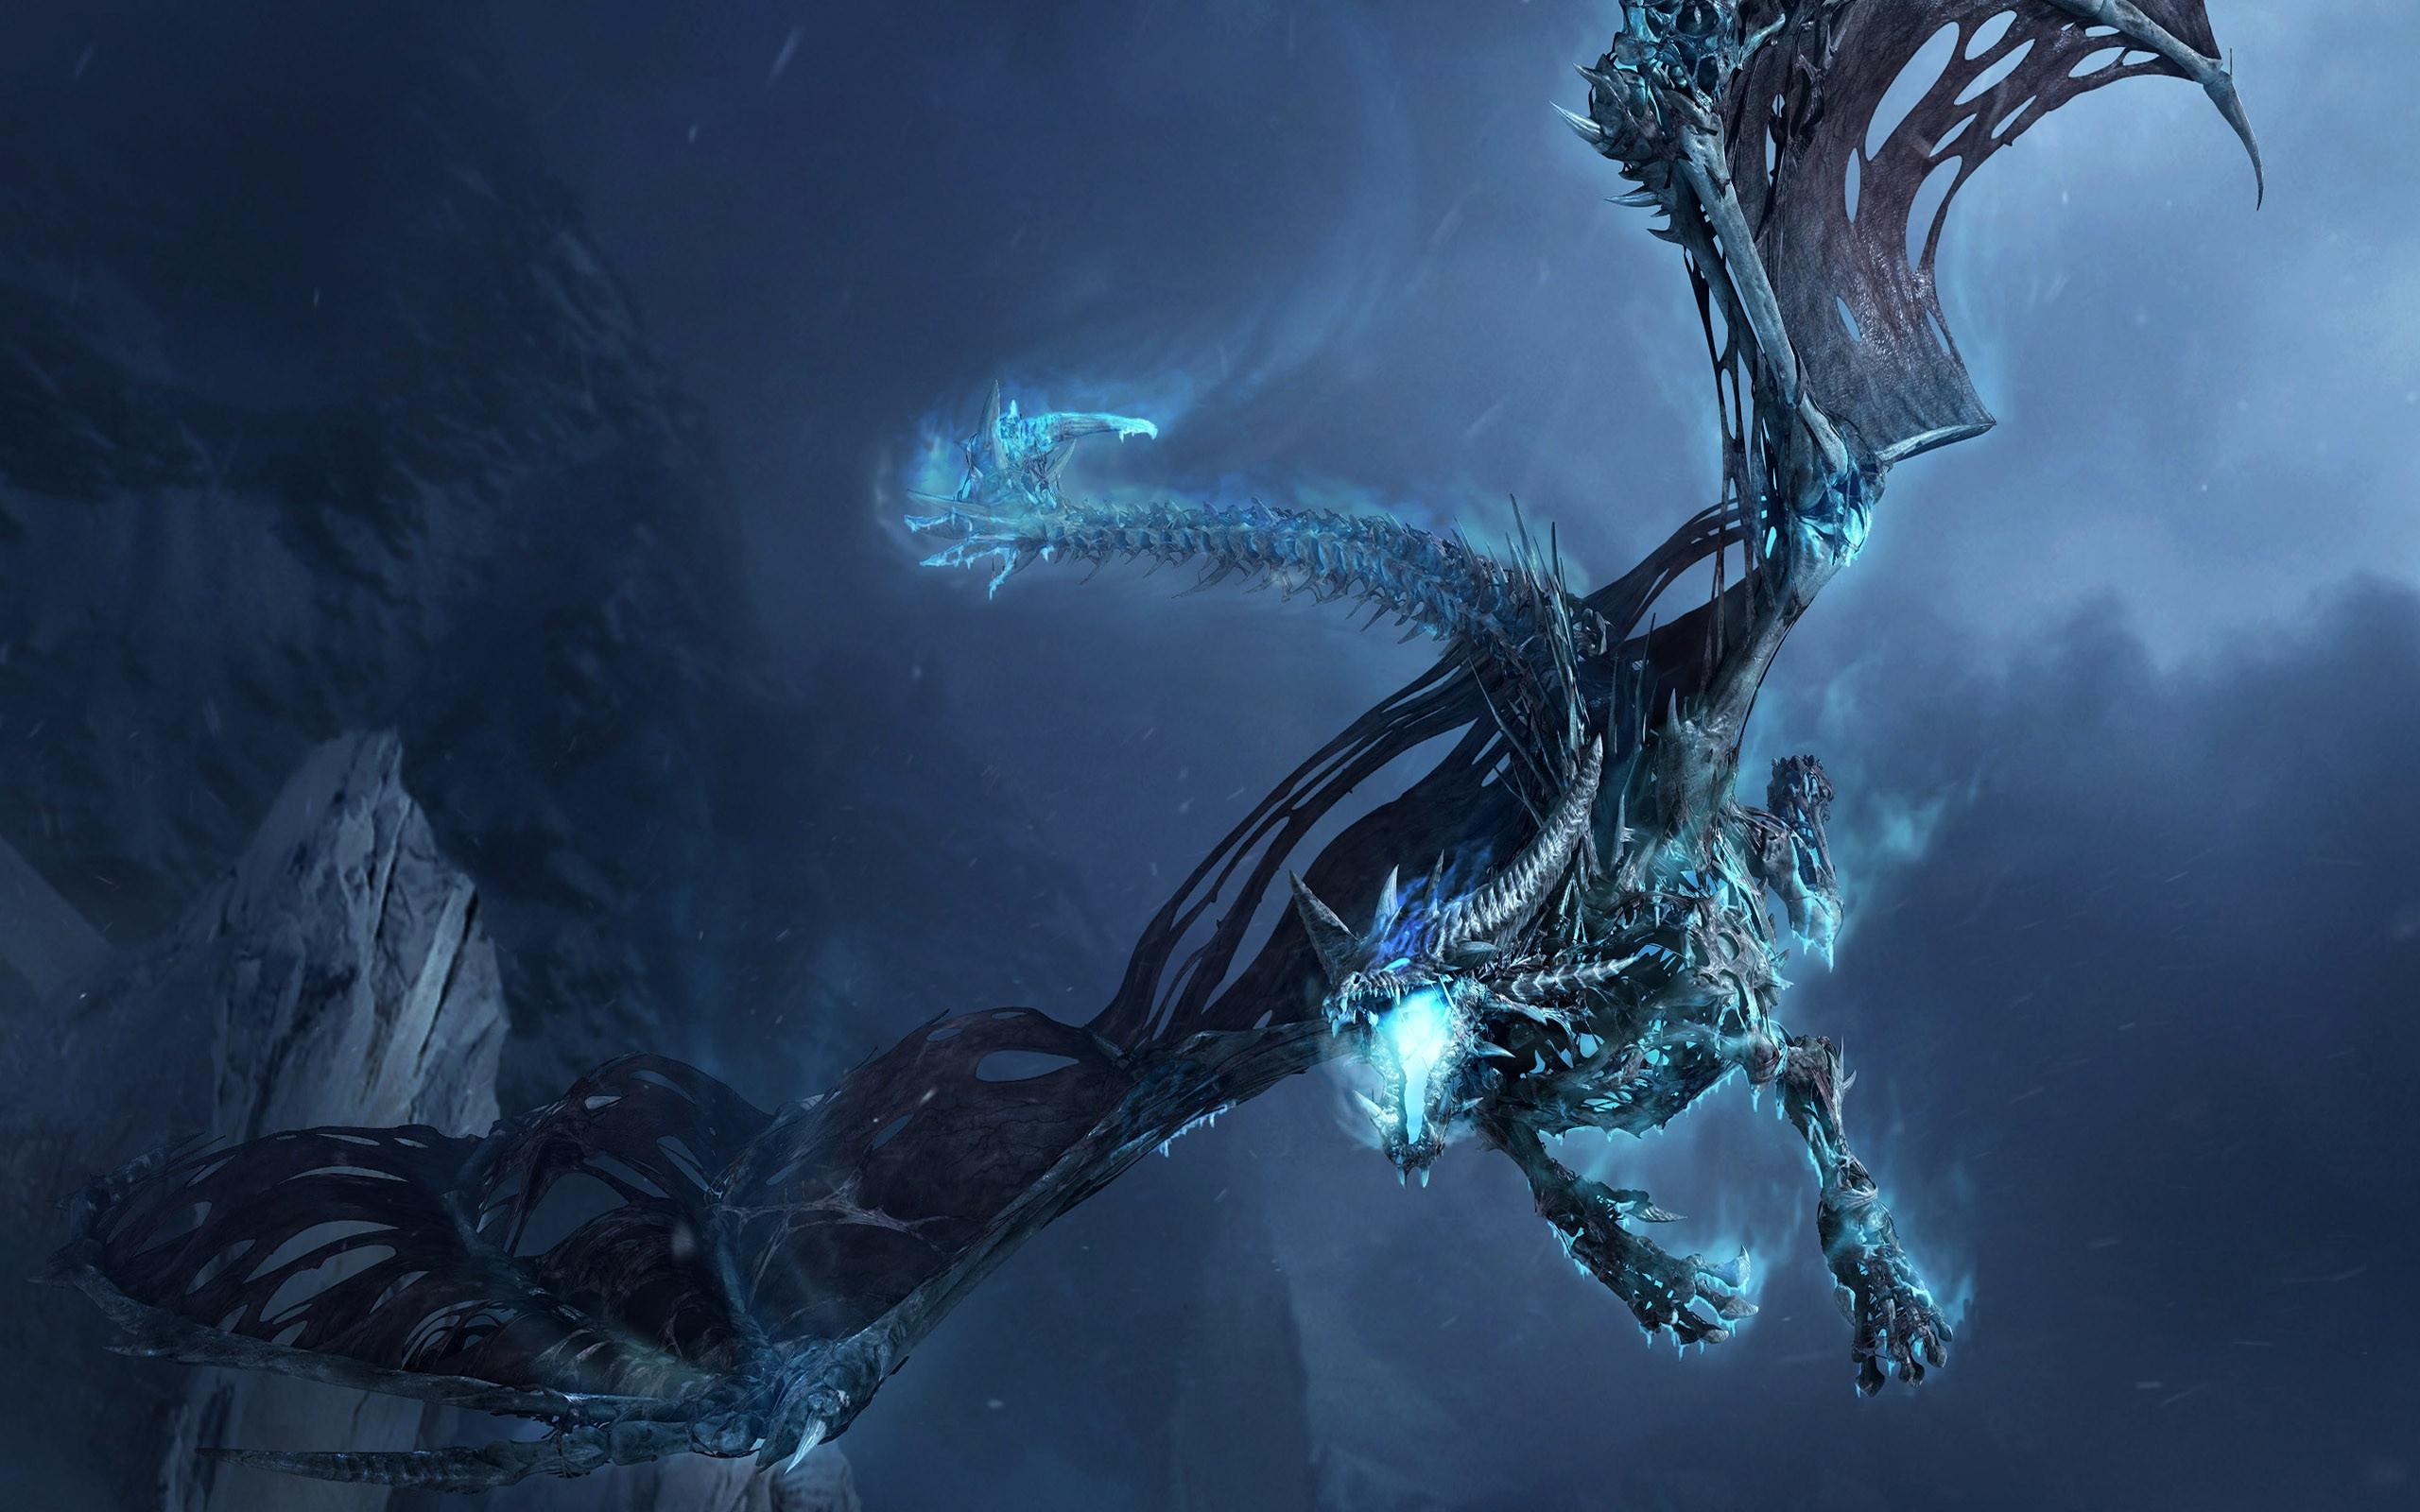 World Of Warcraft Wallpaper Wallpapers) – HD Wallpapers